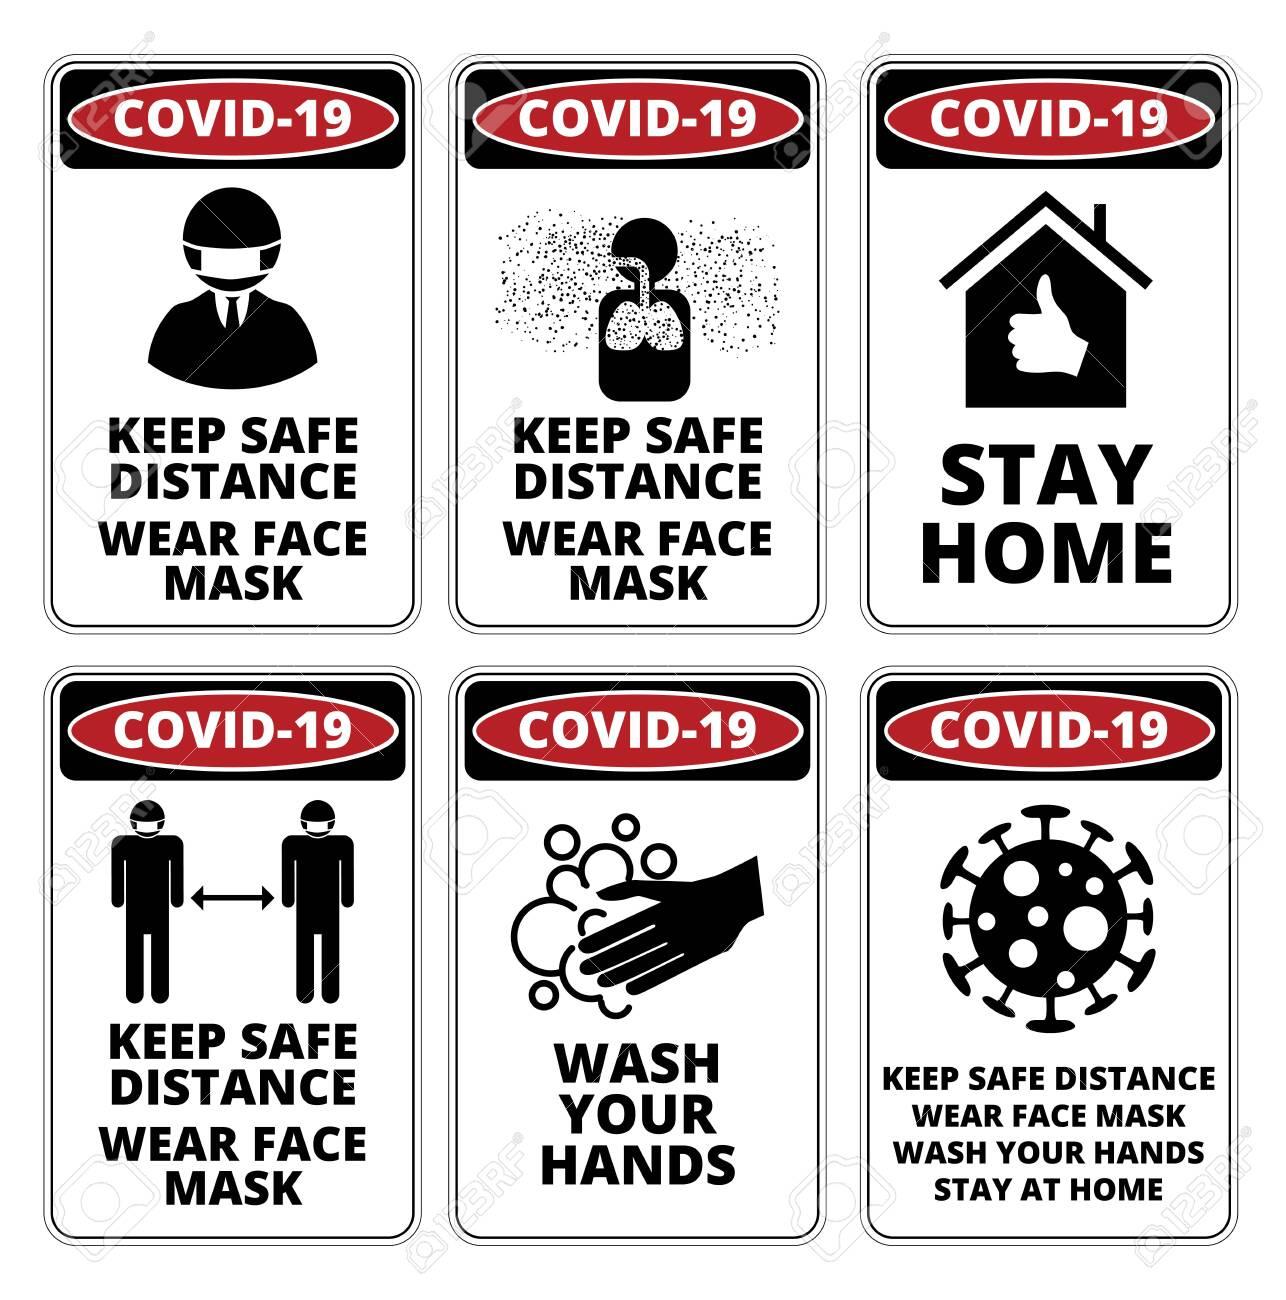 Covid-19 Danger Signs Set - 145849098